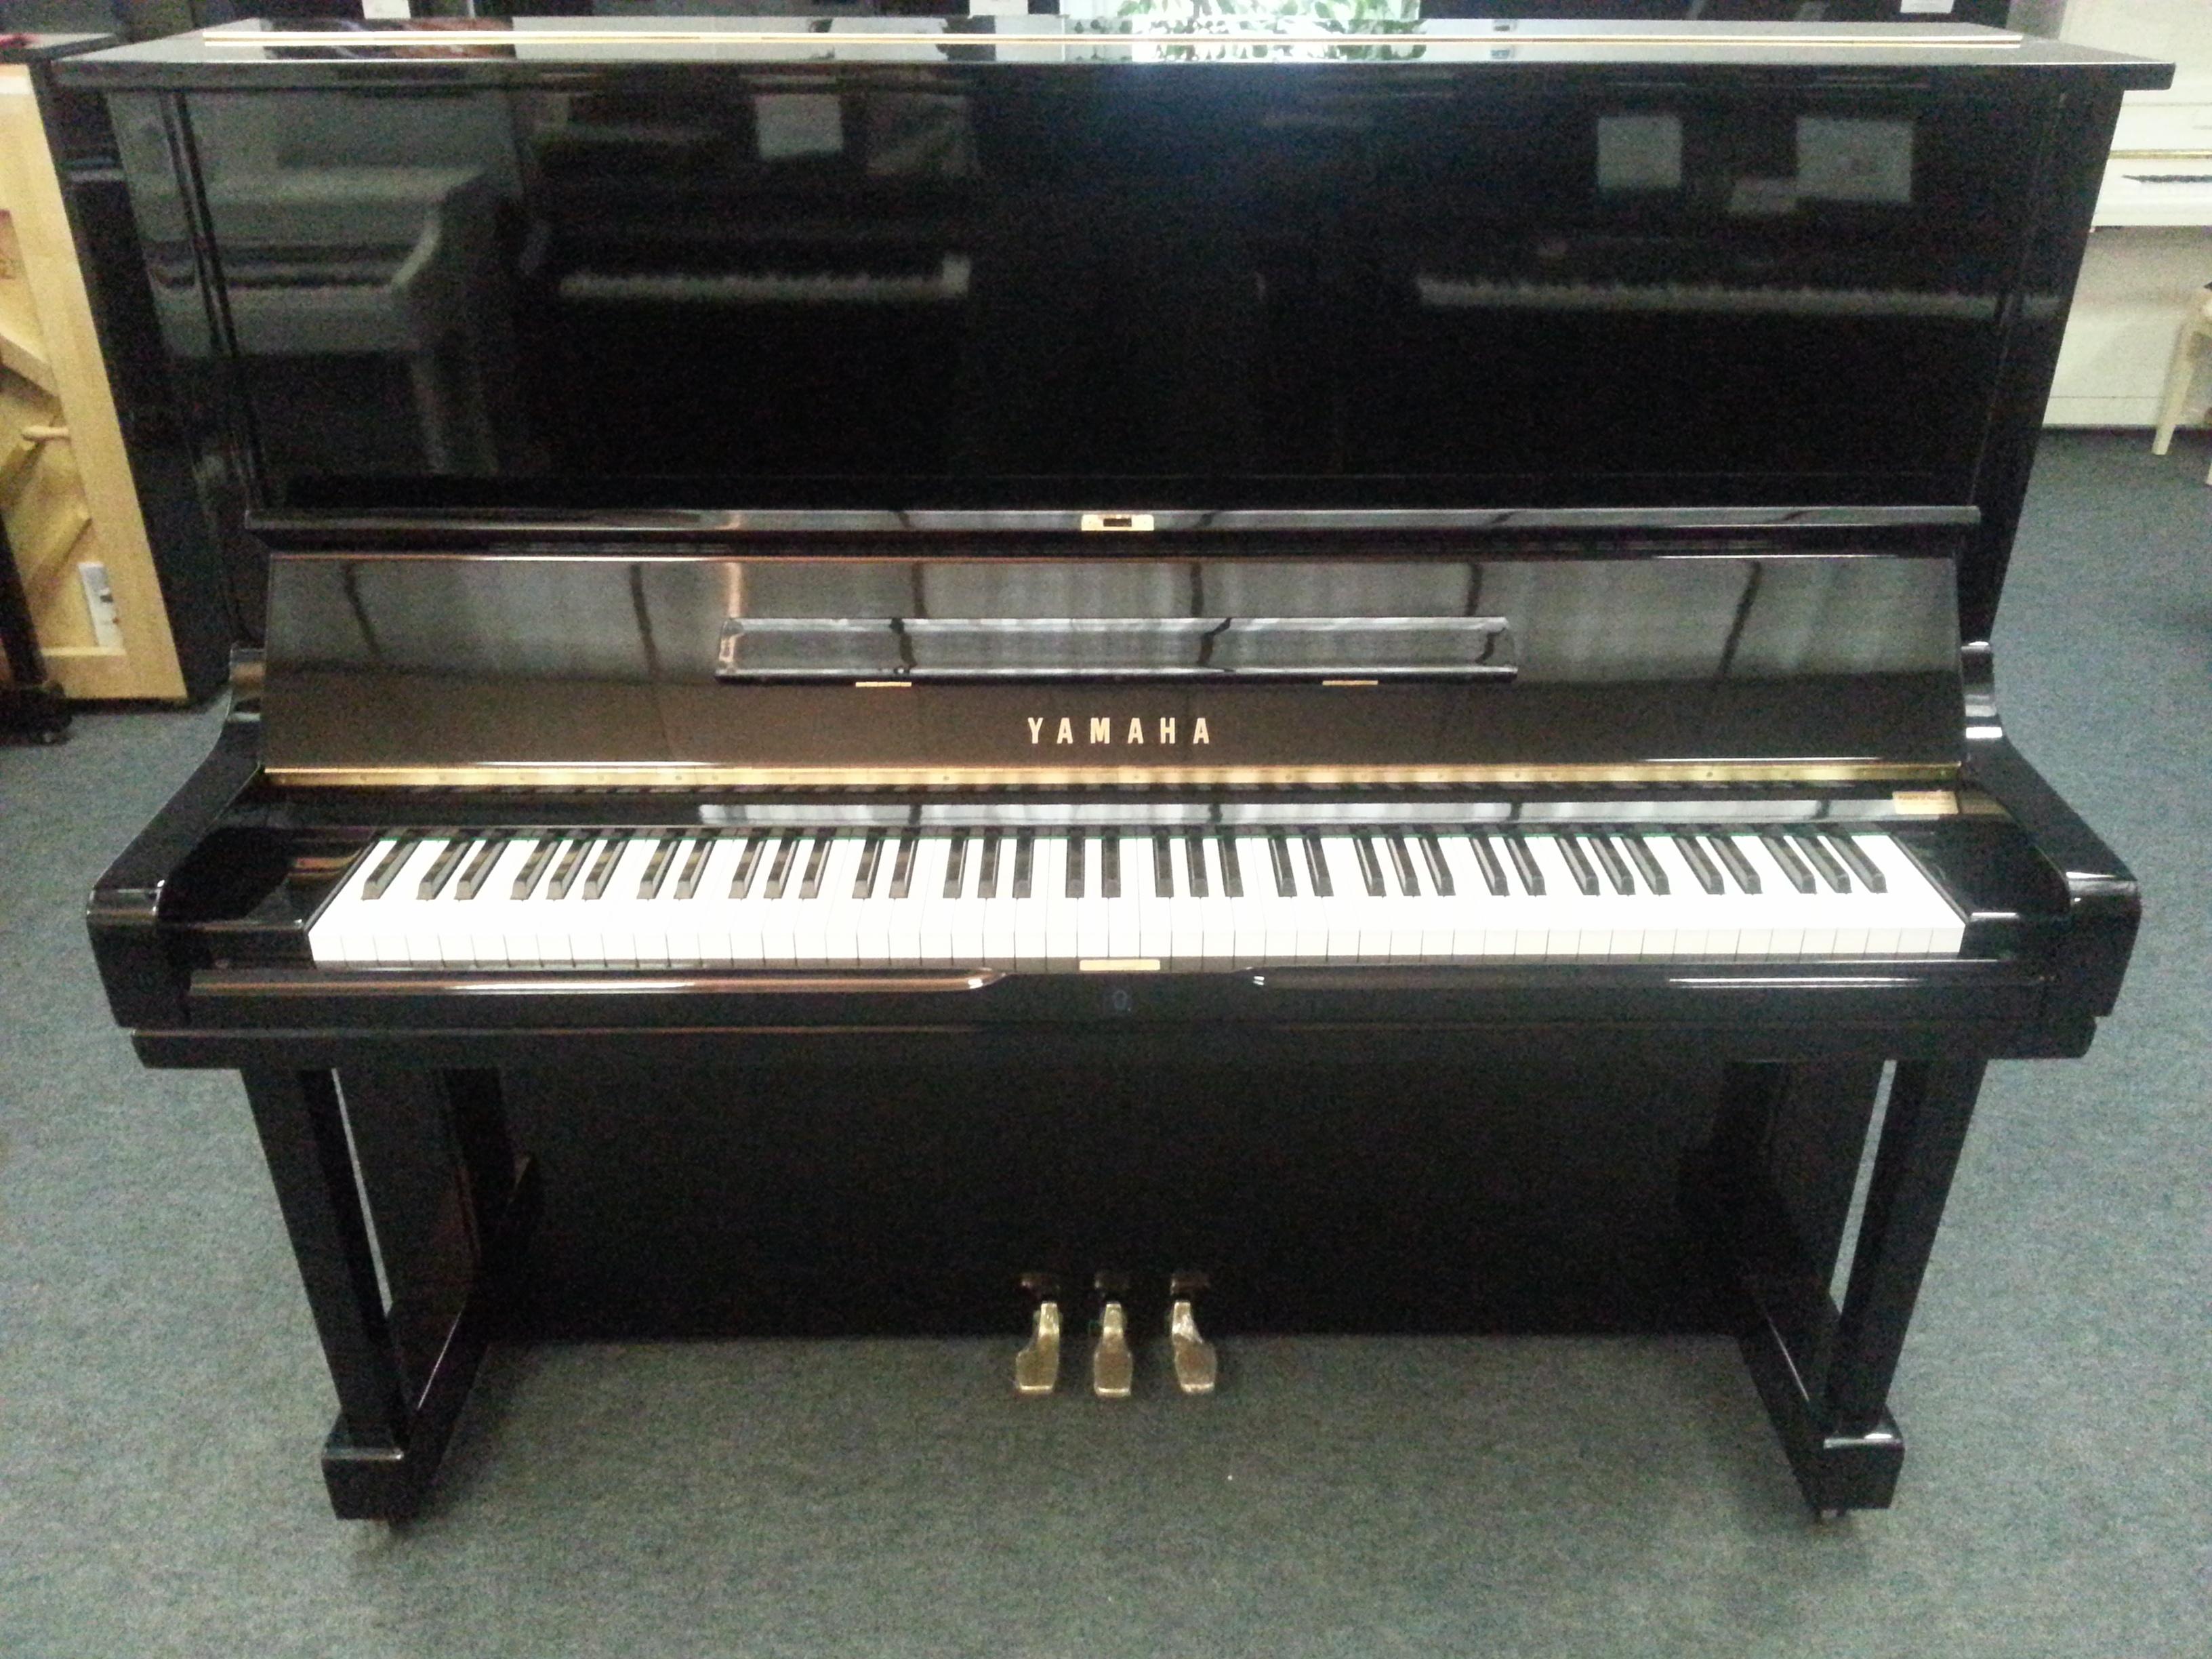 Yamaha u3 image 891712 audiofanzine for New yamaha u3 piano price